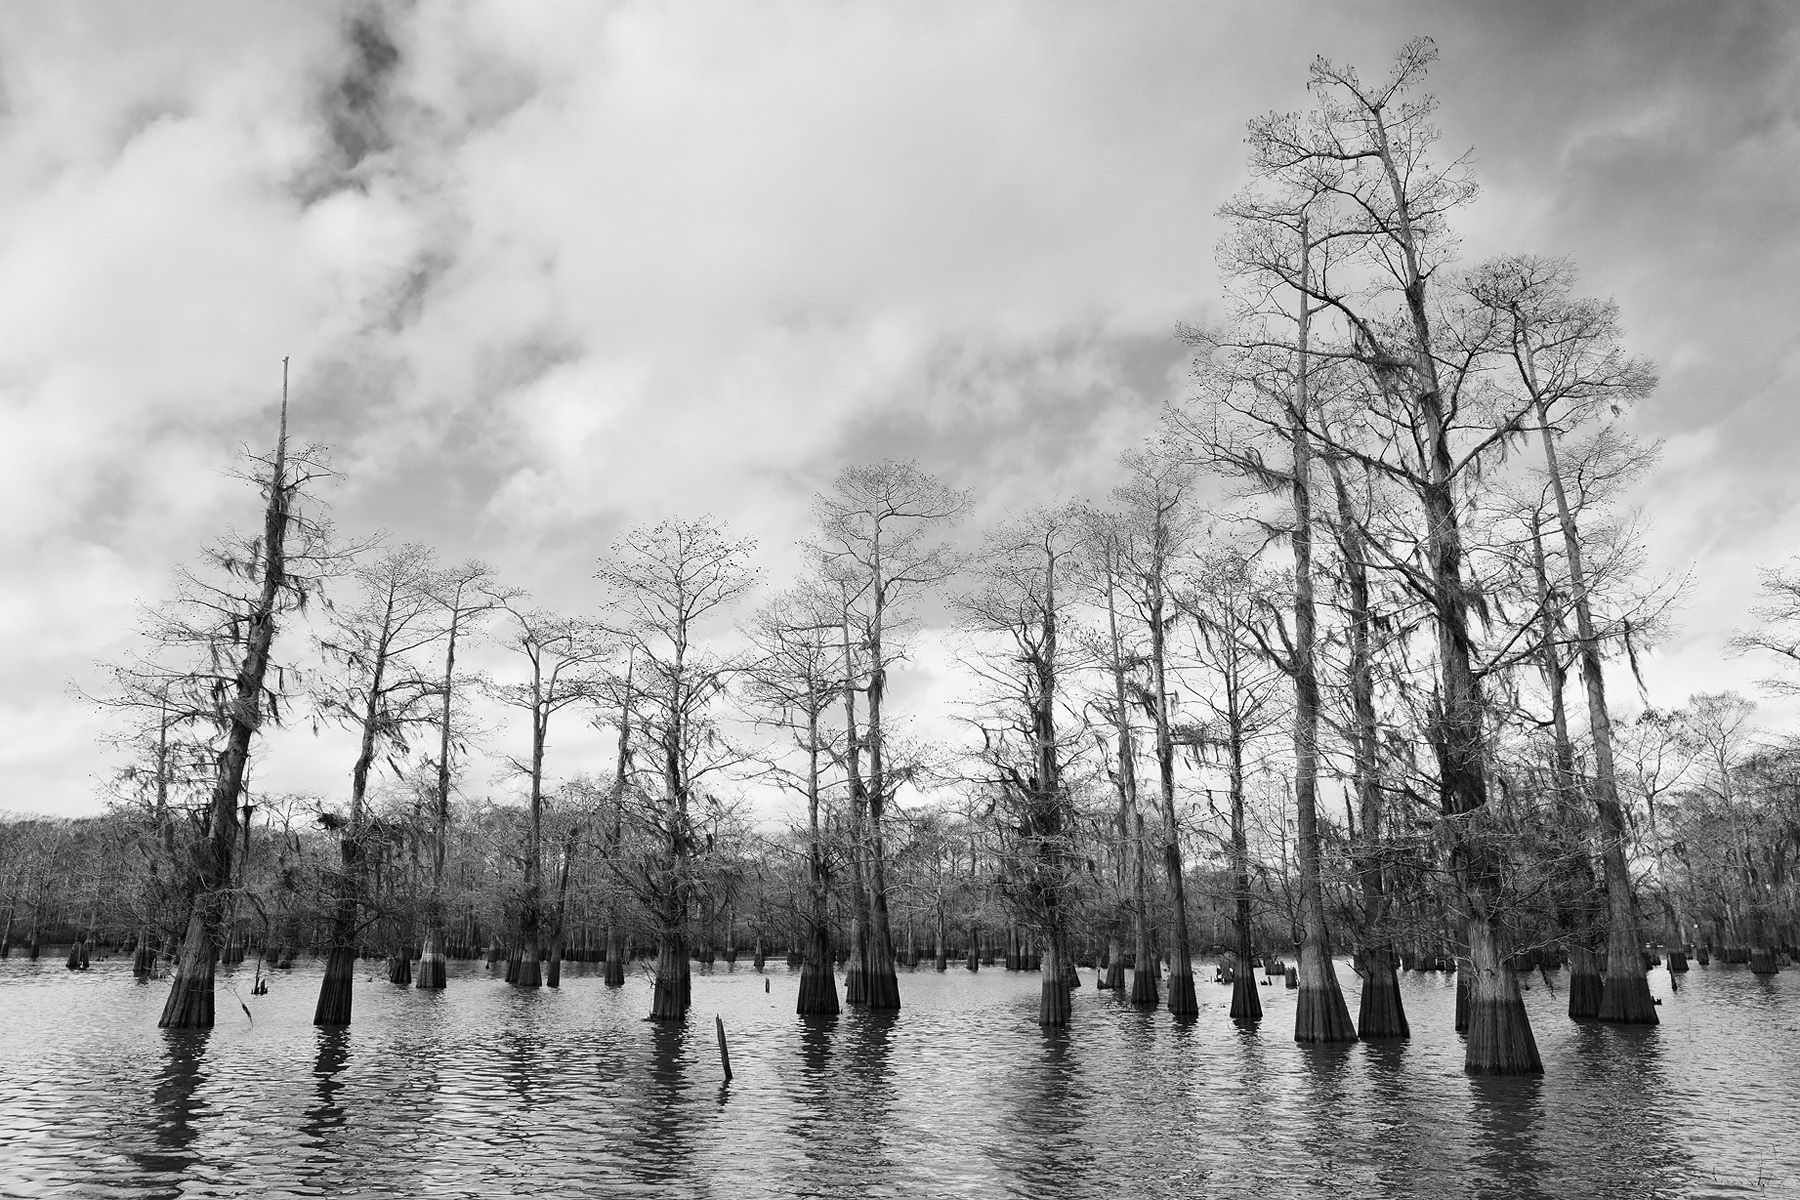 Cypress tree forrest in the bayou_B&W_E4A2246-Atchafalaya Basin, LA, USA.jpg